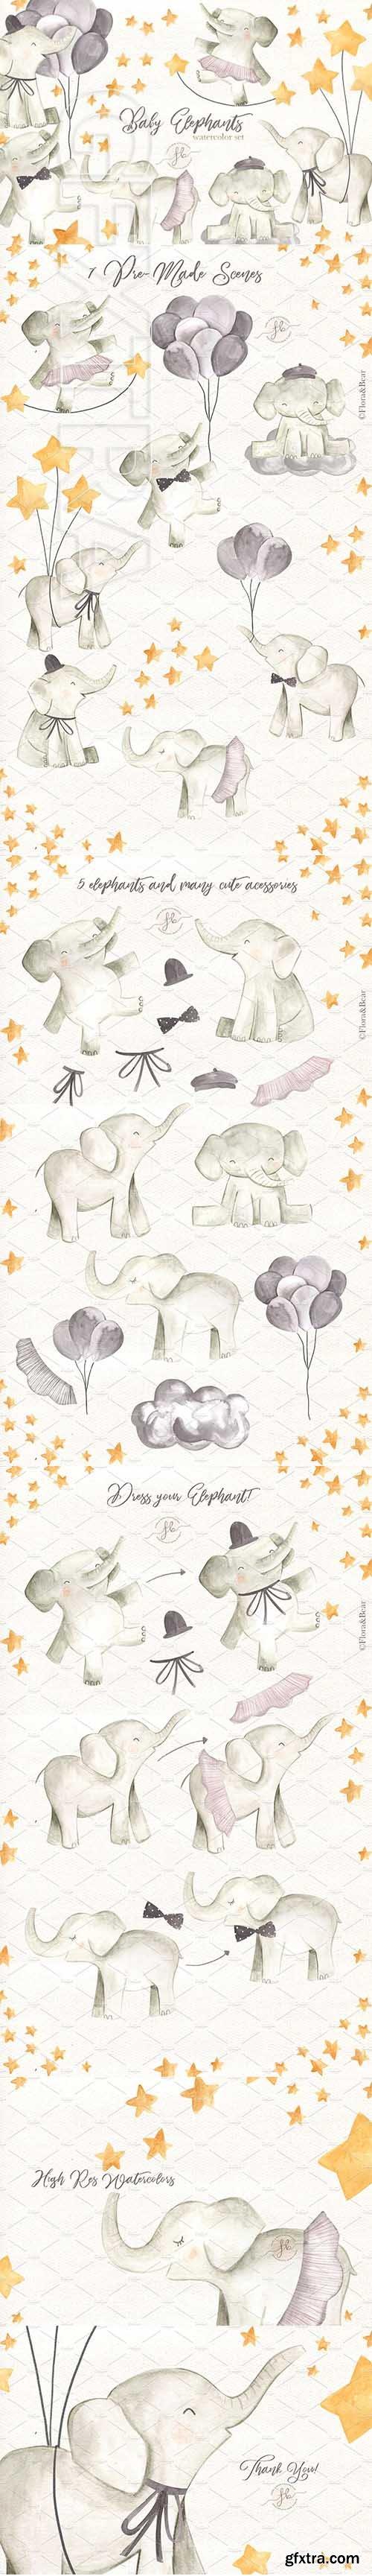 CreativeMarket - Baby Elephants 2523323